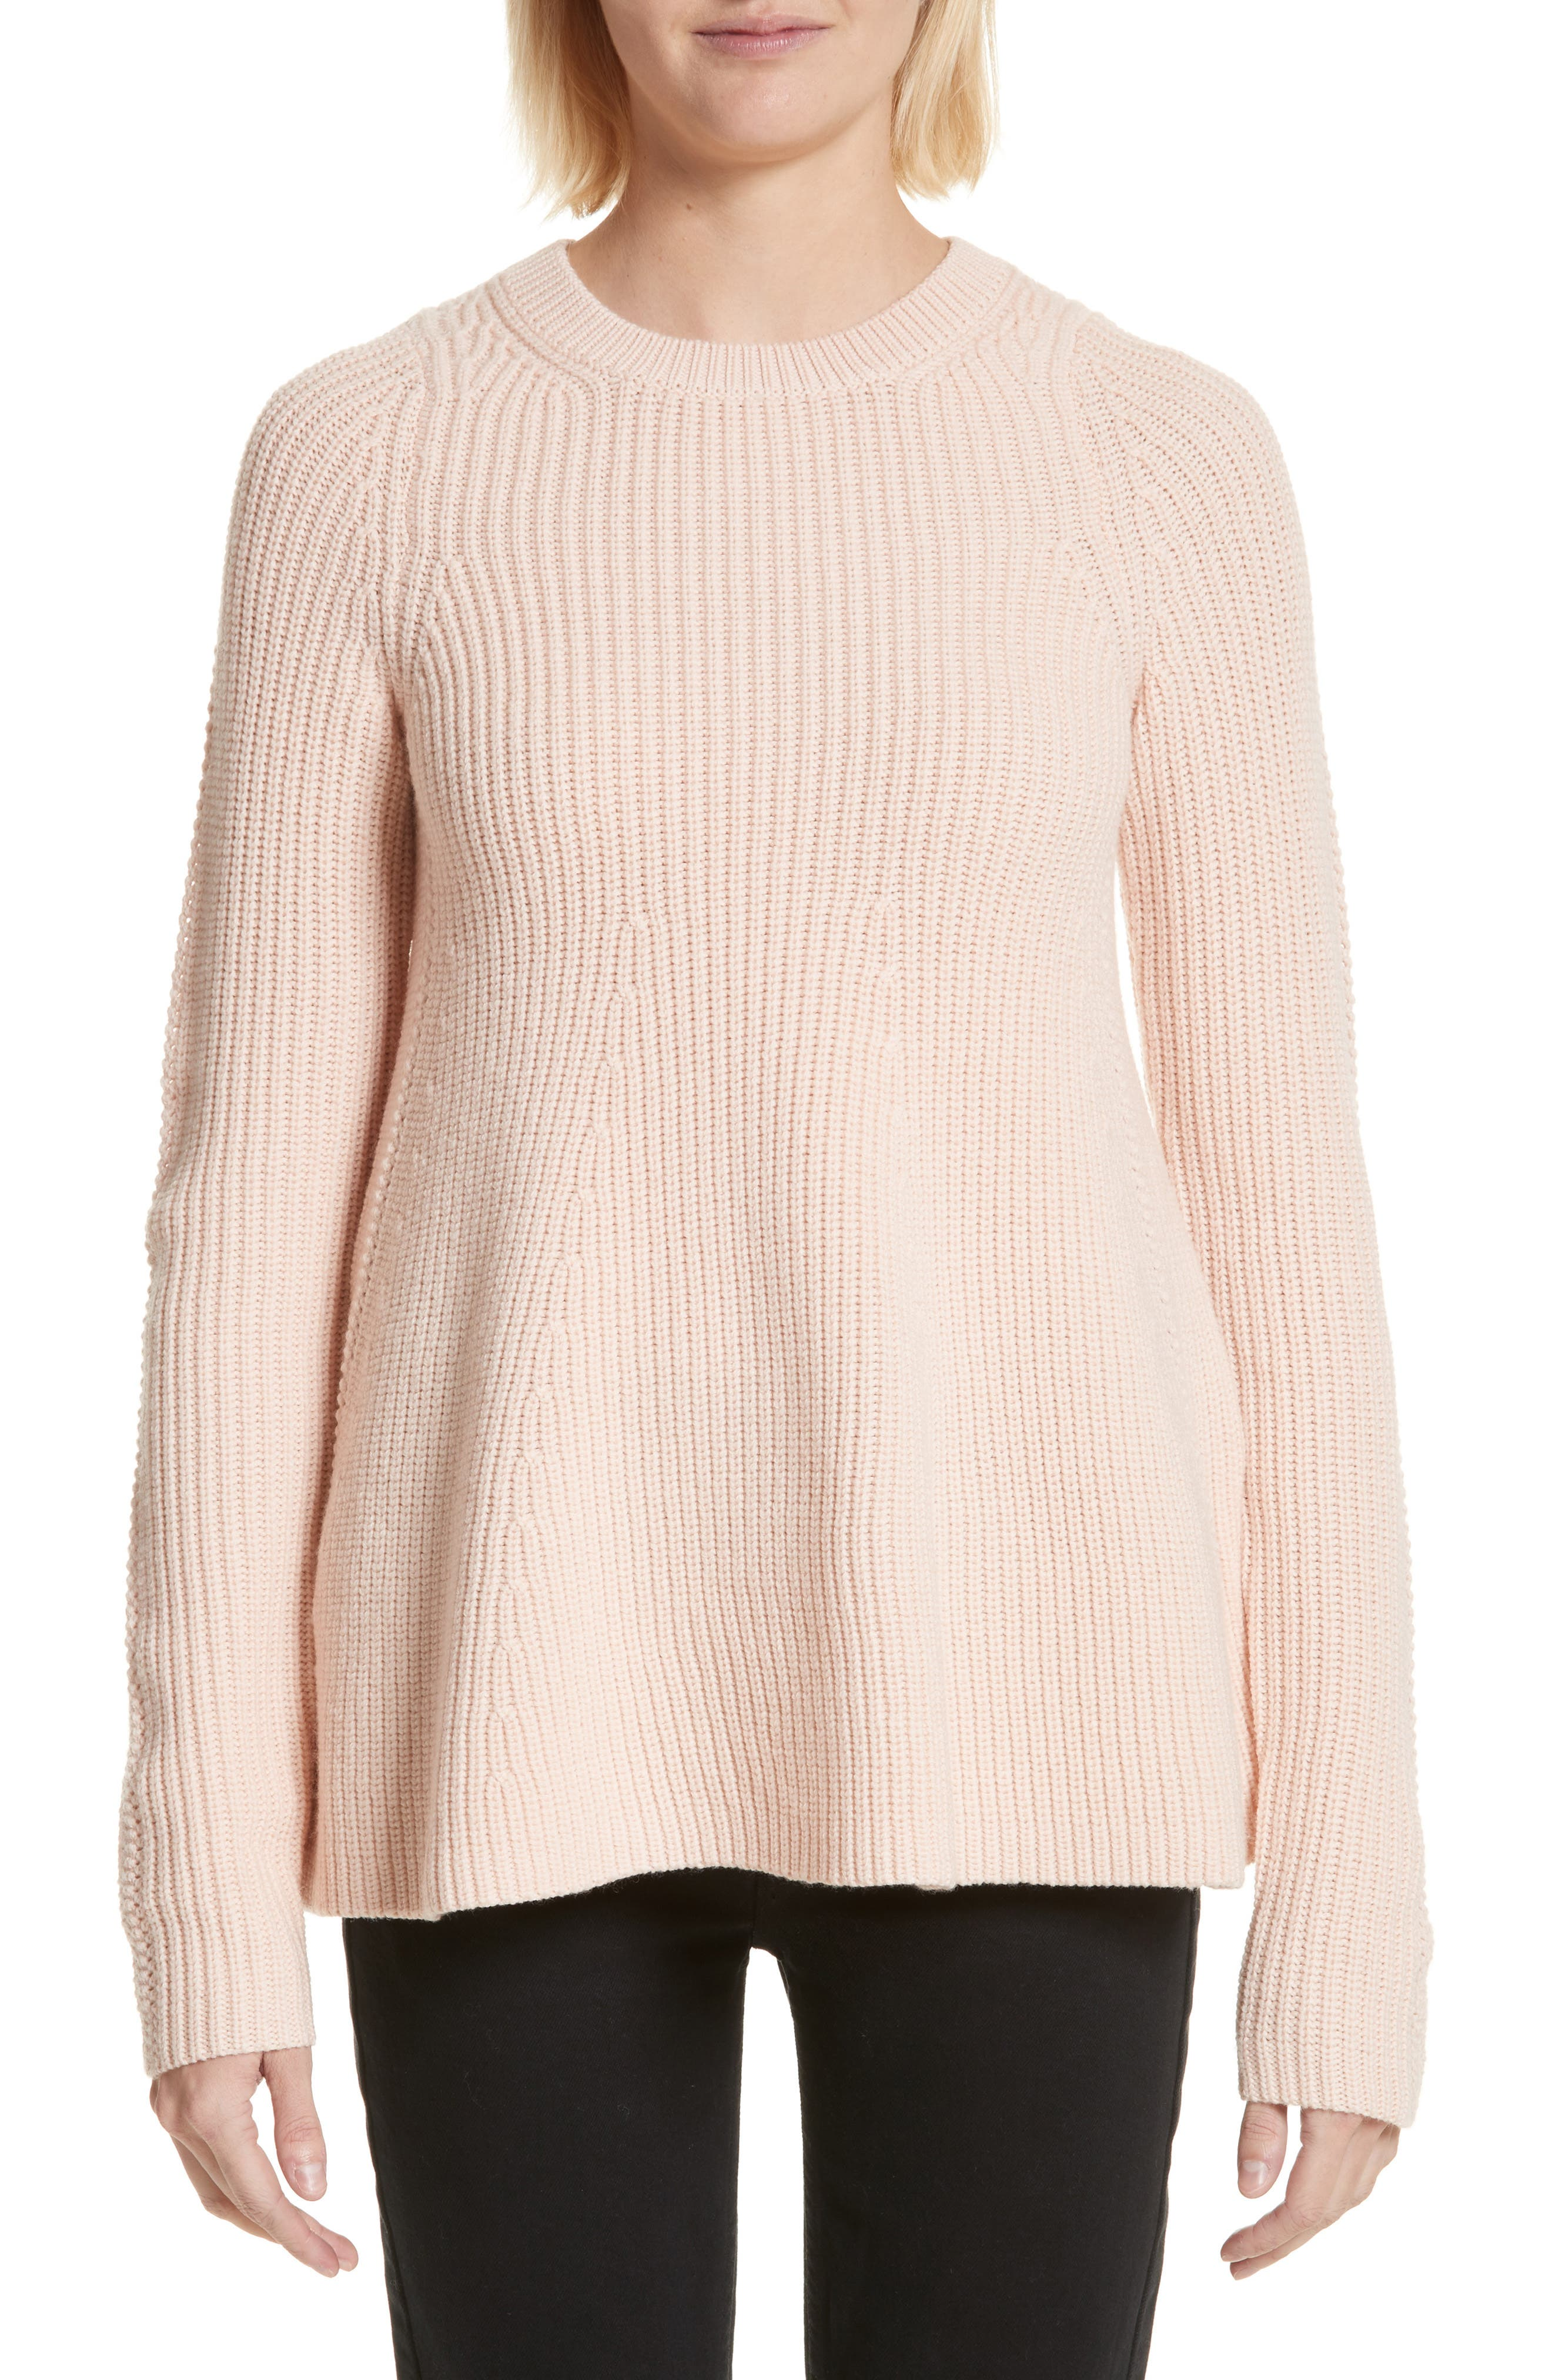 JASON WU GREY Merino Wool Trapeze Sweater in Pale Rose